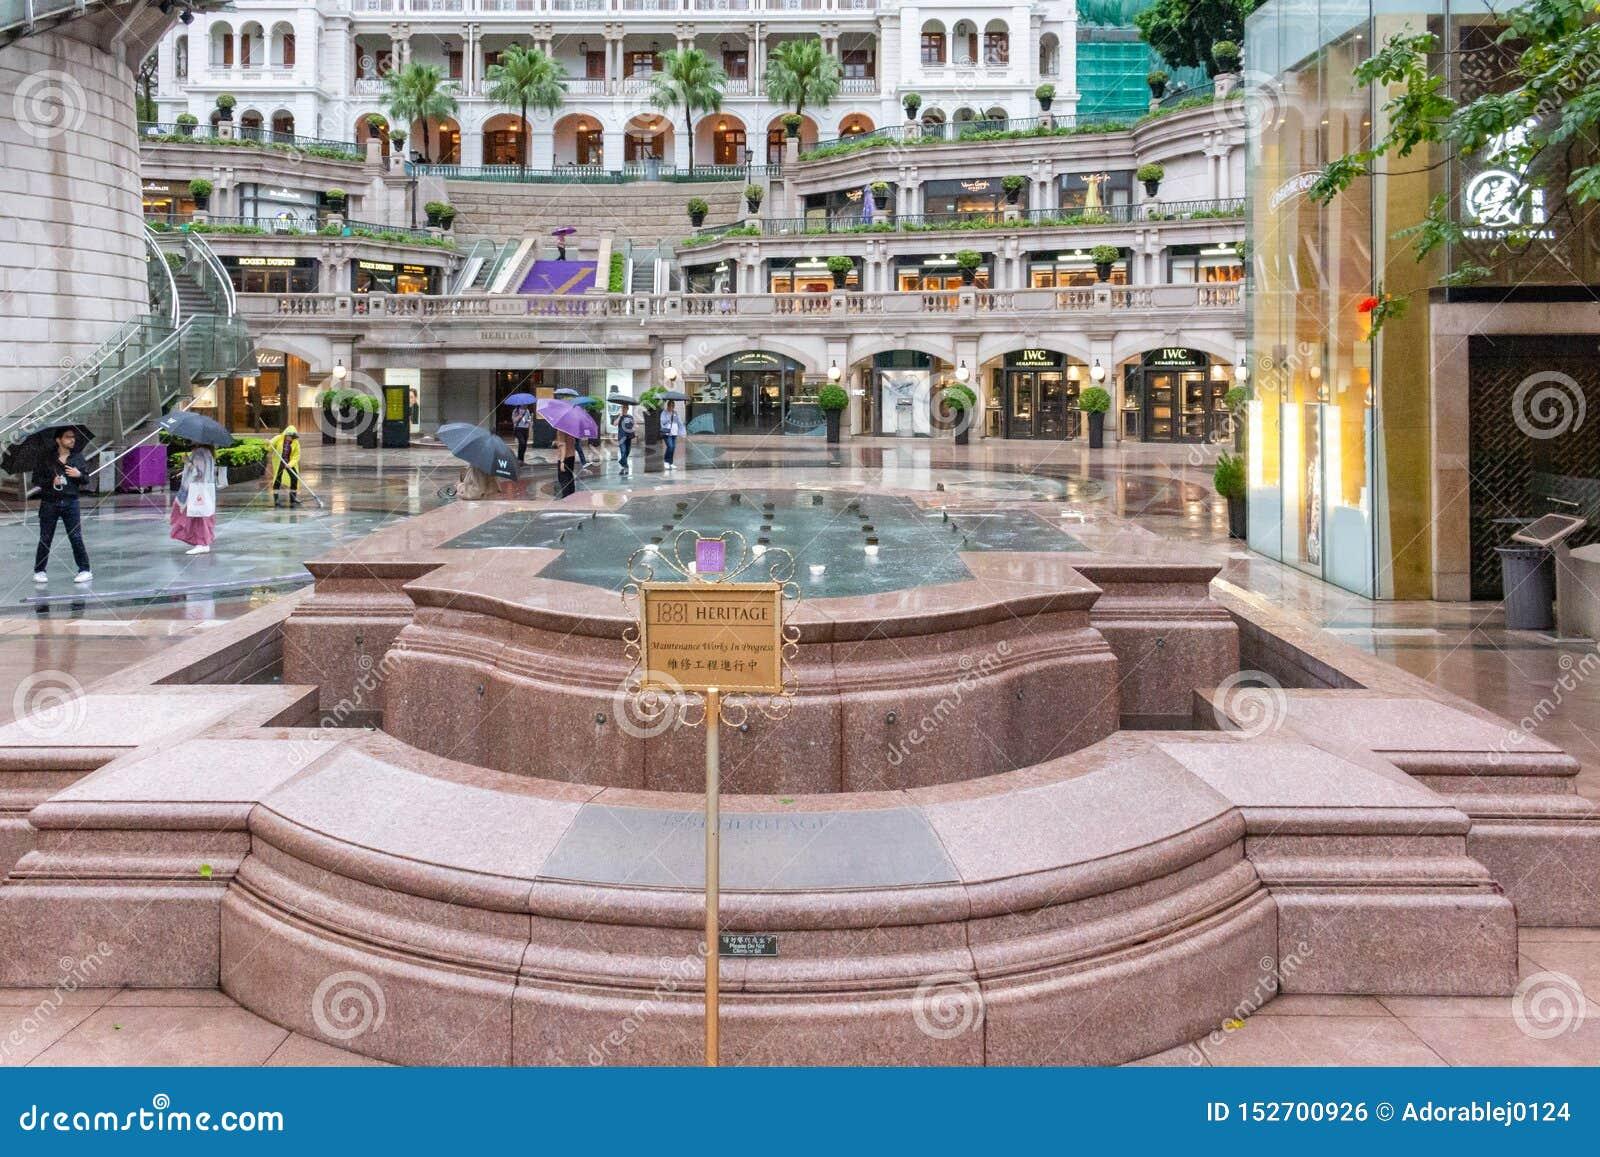 Erbeinkaufszentrum 1881 bei Tsim Sha Tsui, Kowloon, Hong Kong